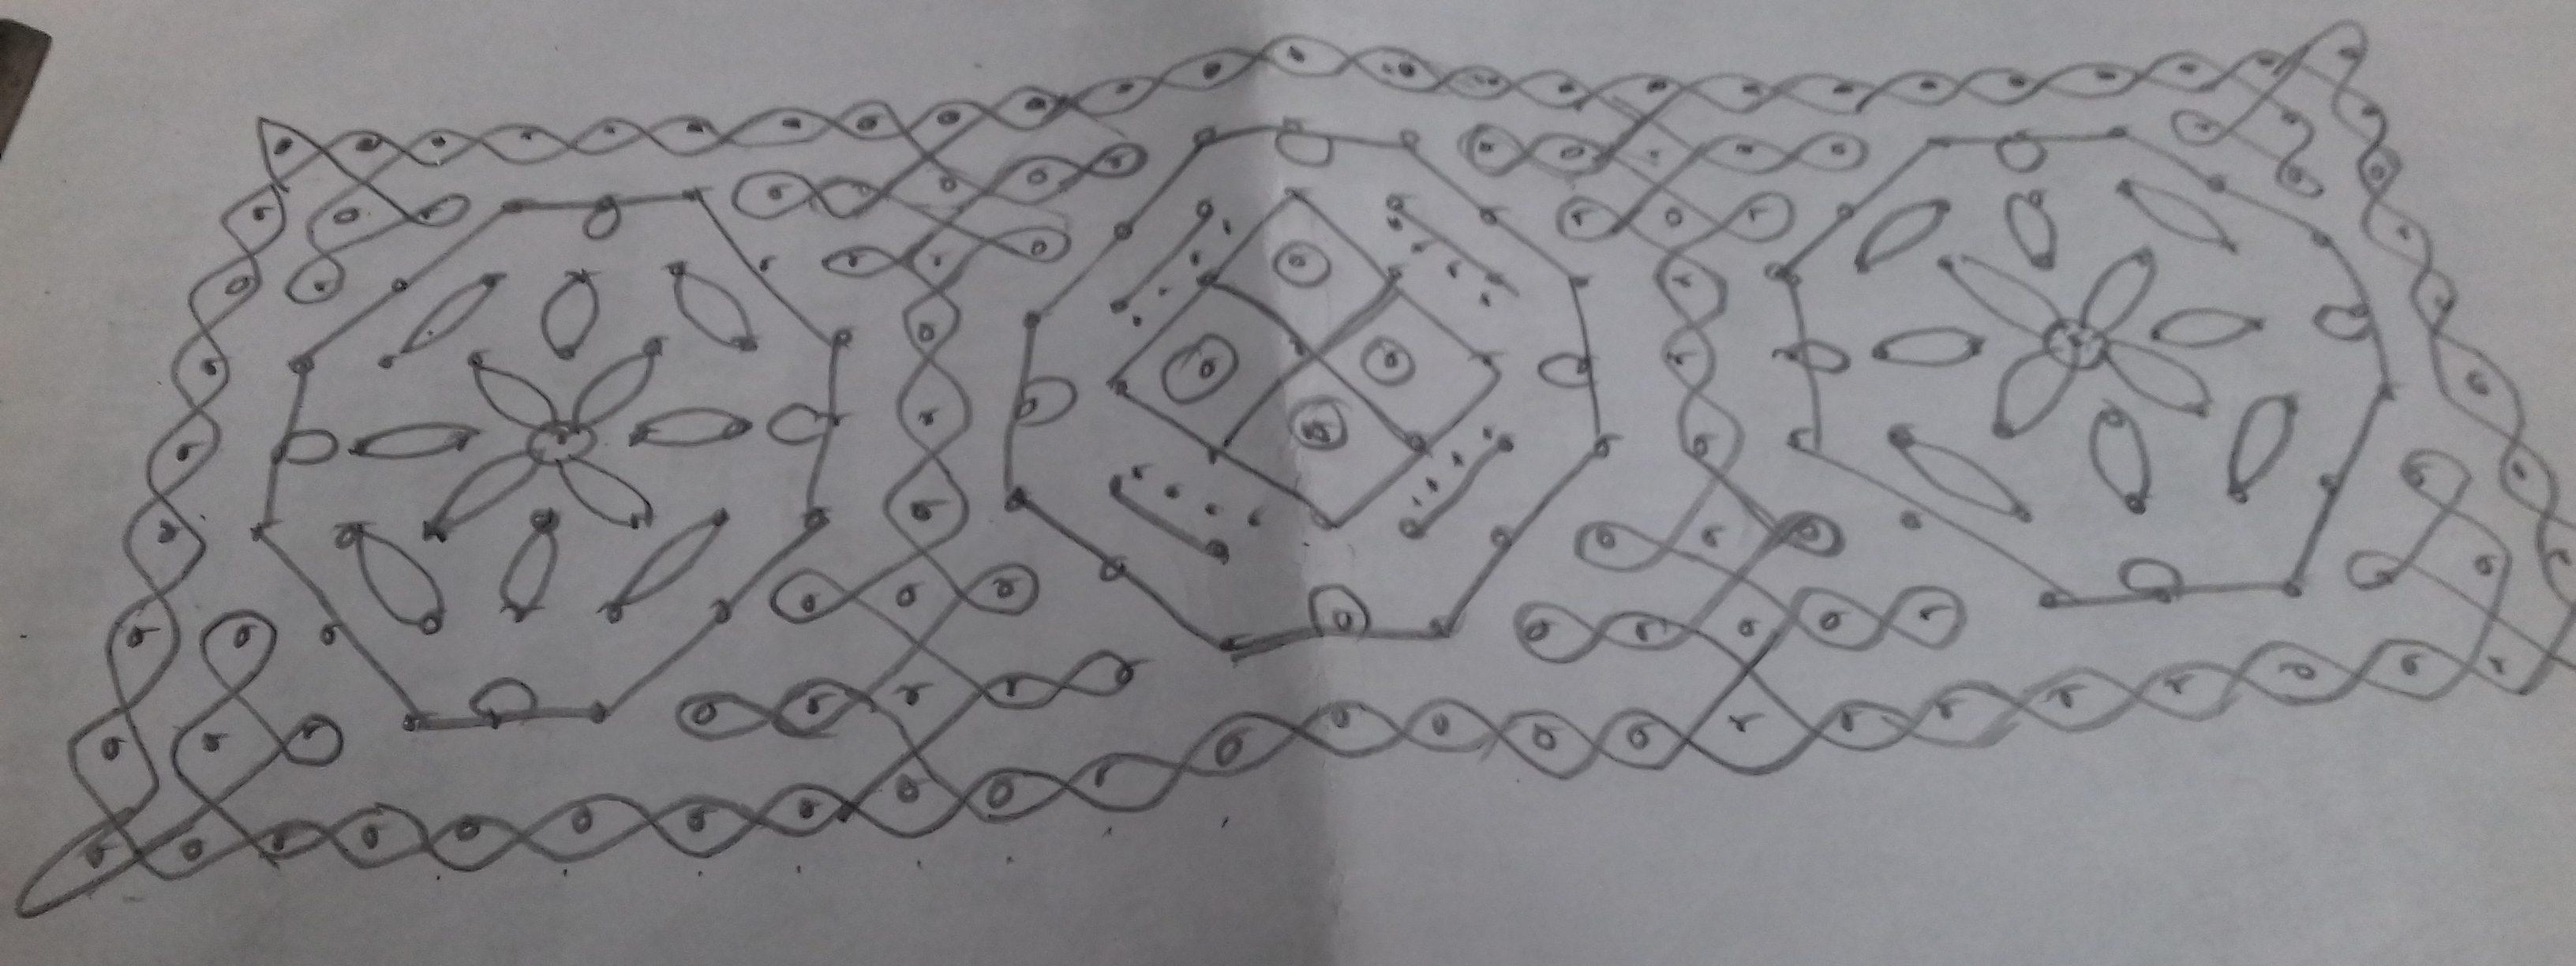 design with chikku border kolam || Sikku Kolam for contest